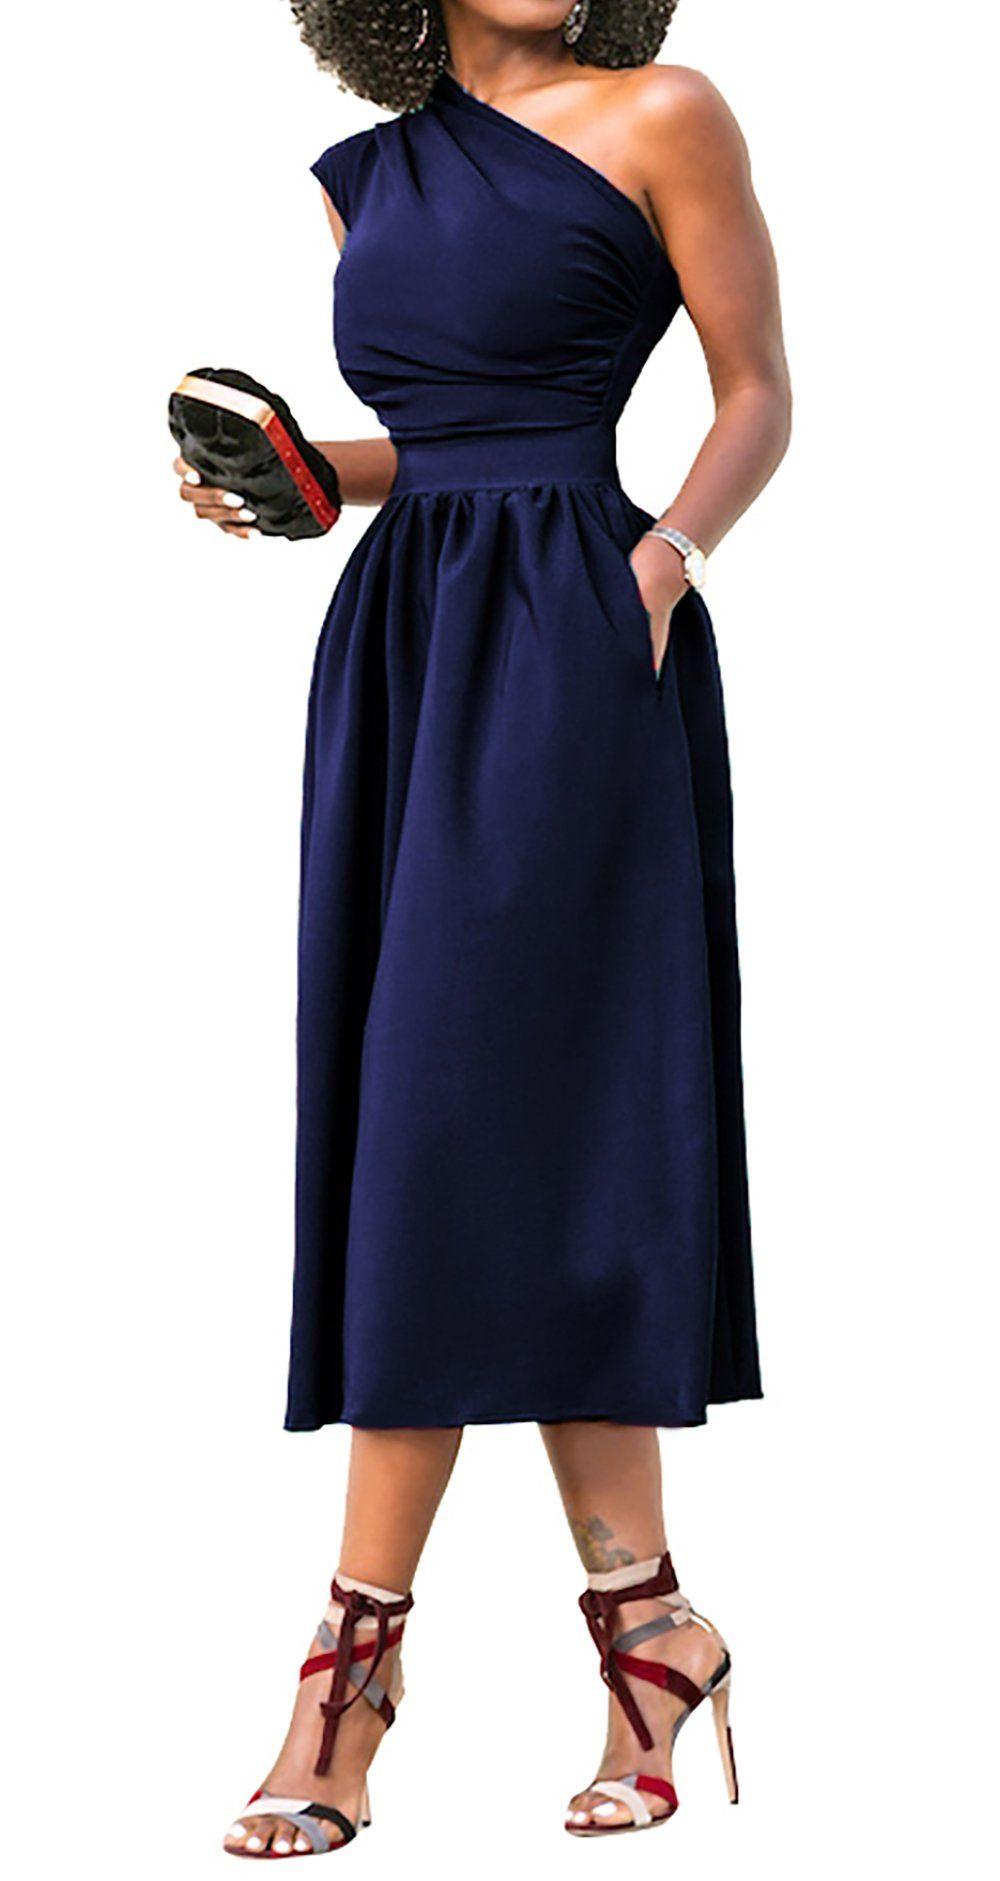 Womens dresses wedding guest  JUSICA Womens Navy Blue Vintage Sleeveless One Shoulder Wedding